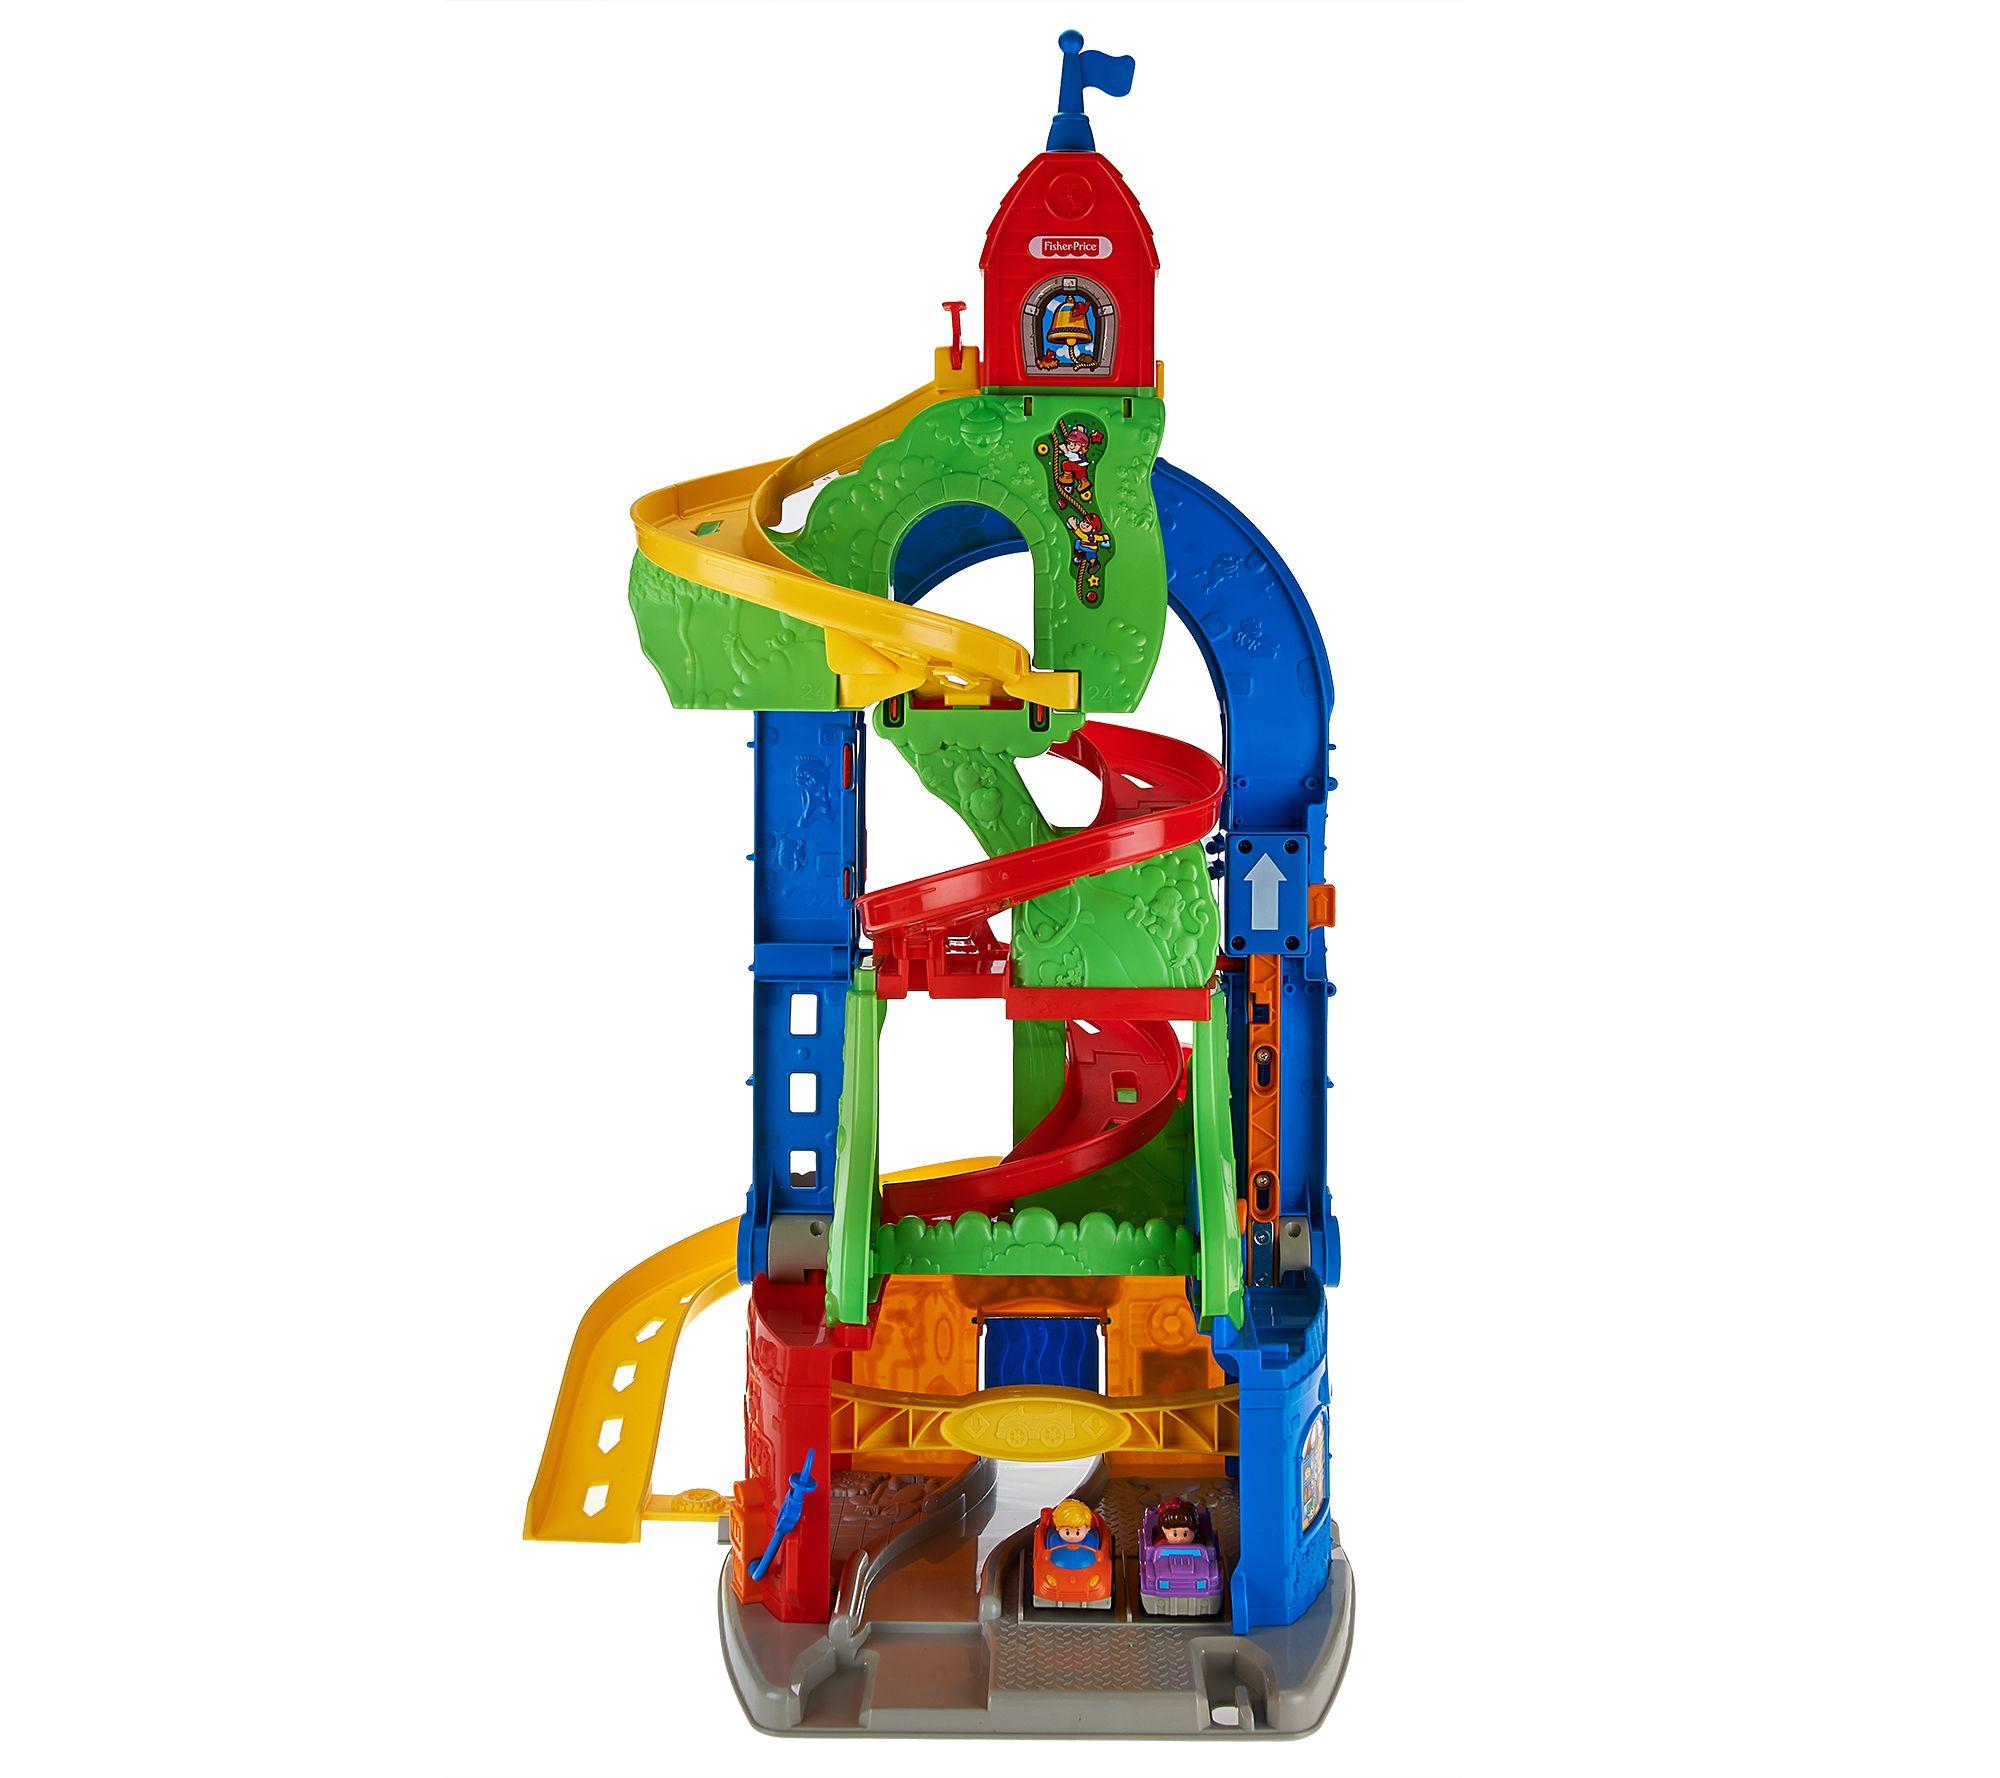 Bathroom Toys Storage Toys Kids Toys And Games Qvccom